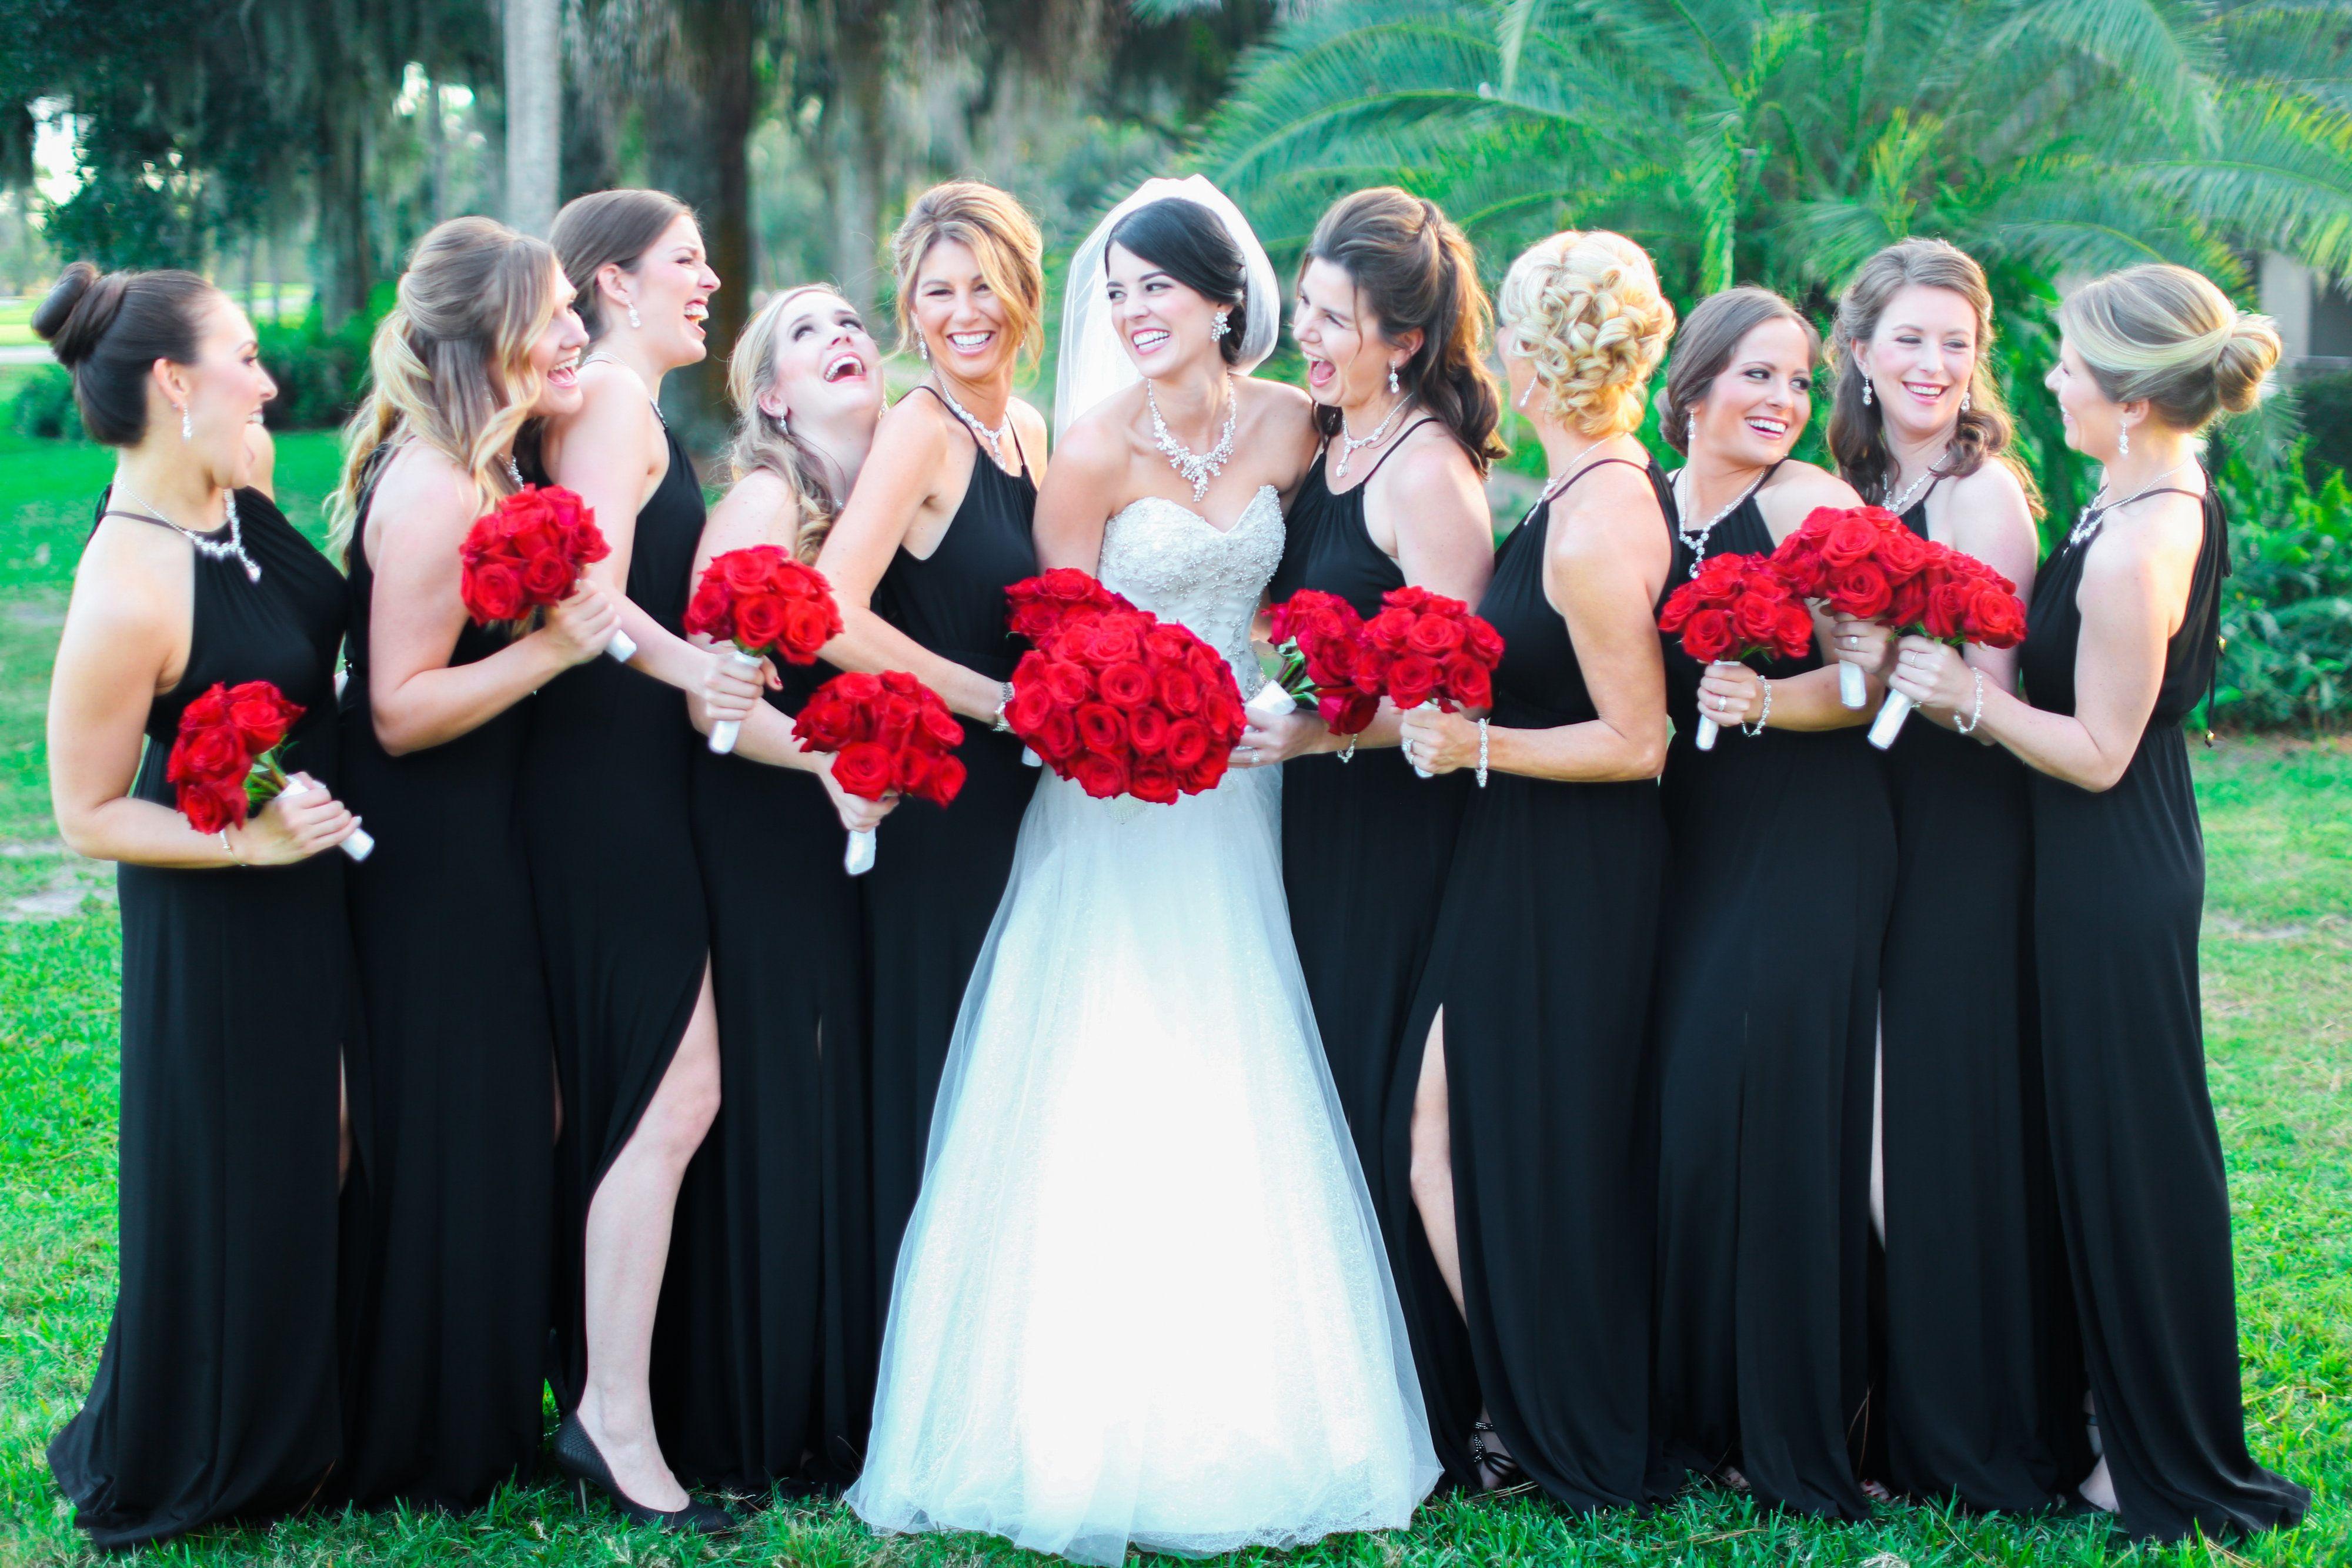 Bride Bridesmaids Photo Bouquets Red Roses Black Dresses Lee Forrest Design Red Black Wedding Classic Black Red Wedding Wedding Classic Red Rose Wedding [ 2667 x 4000 Pixel ]